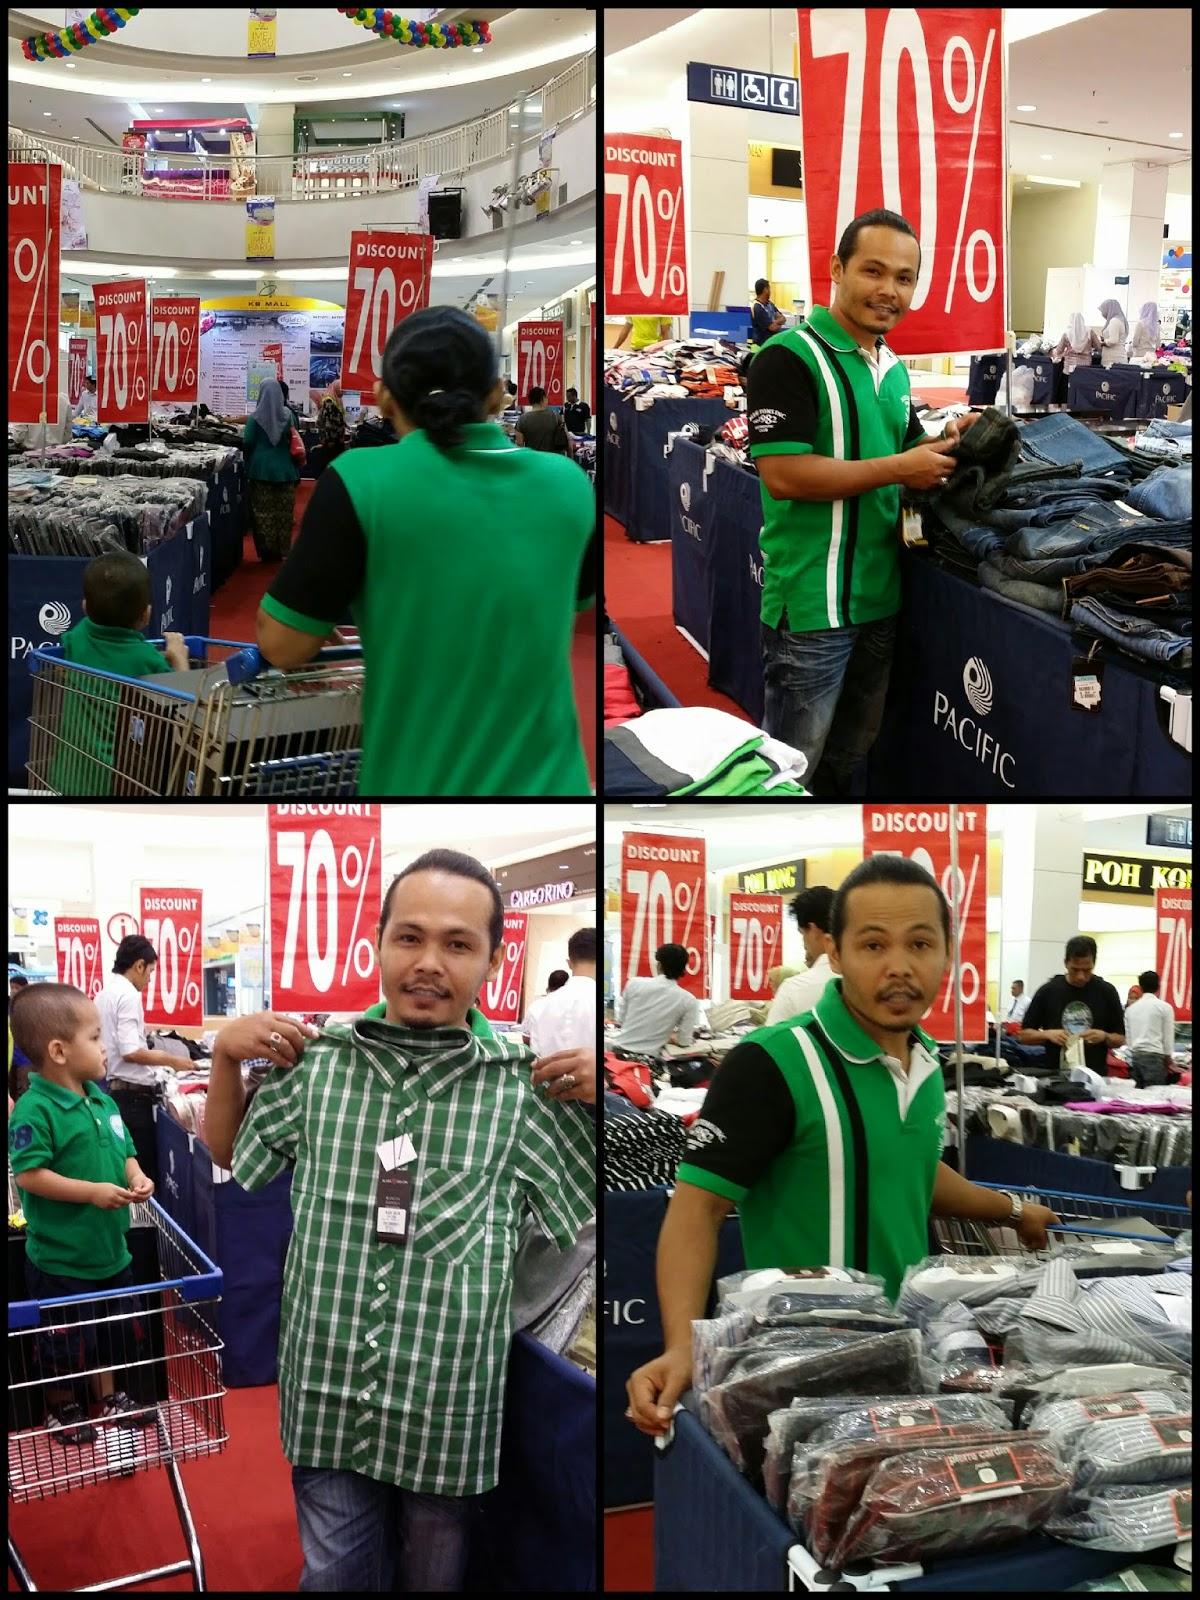 beli pakaian, kbmall, shopping, baju aaron aziz jakel, baju raya 2014, jualan murah kbmall, baju raya,